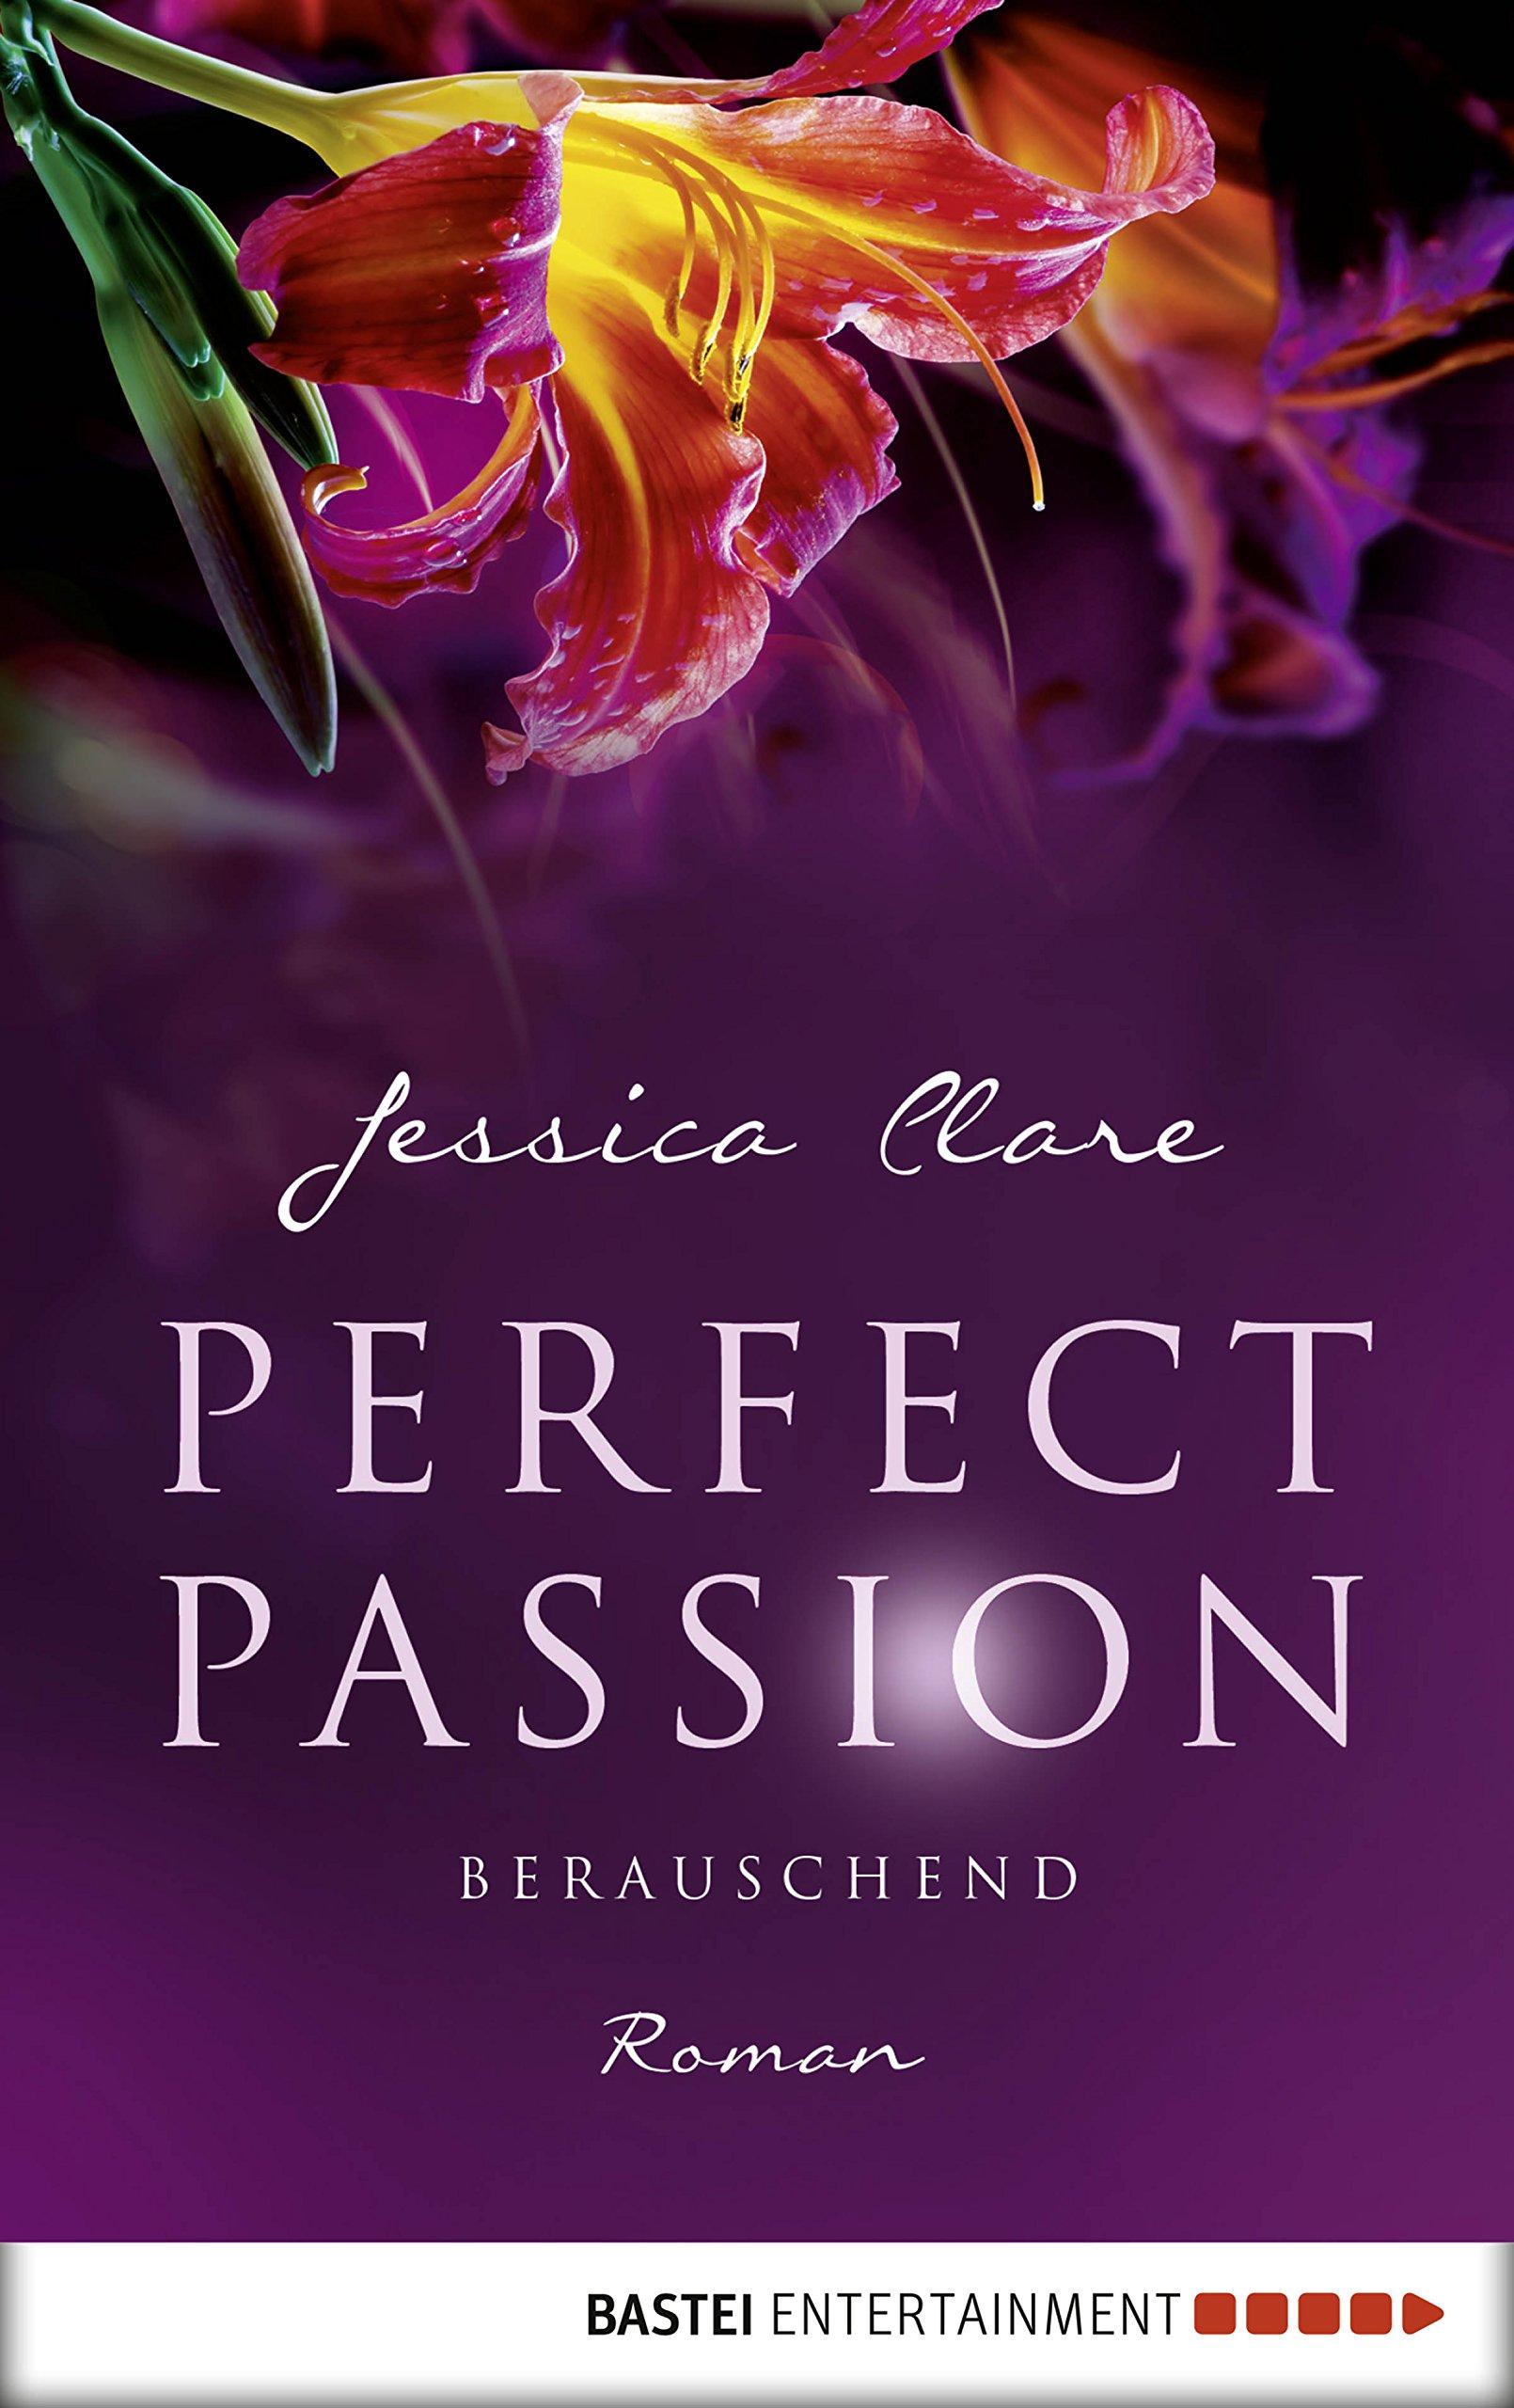 Perfect Passion - Berauschend: Roman (German Edition)